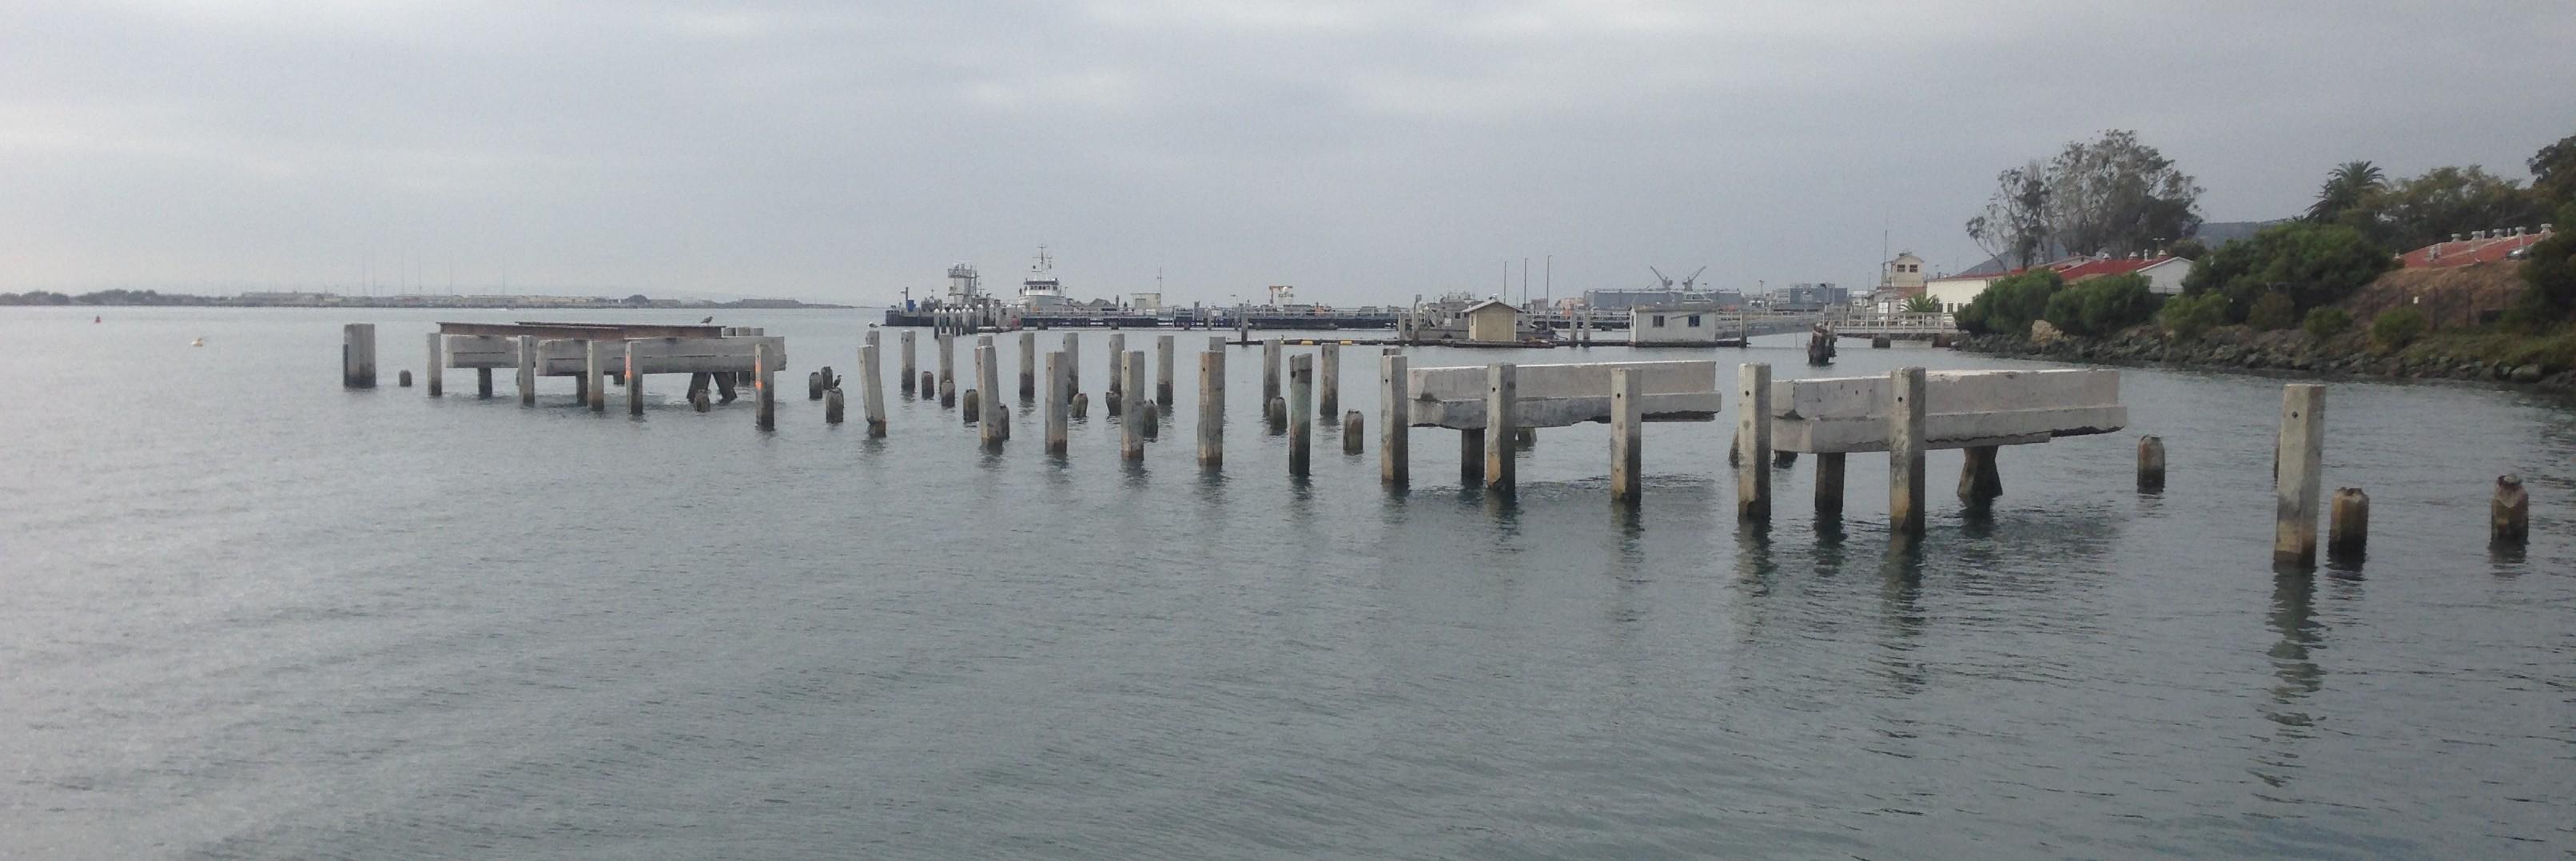 Fender Design – UCSD Nimitz Pier & Wharf